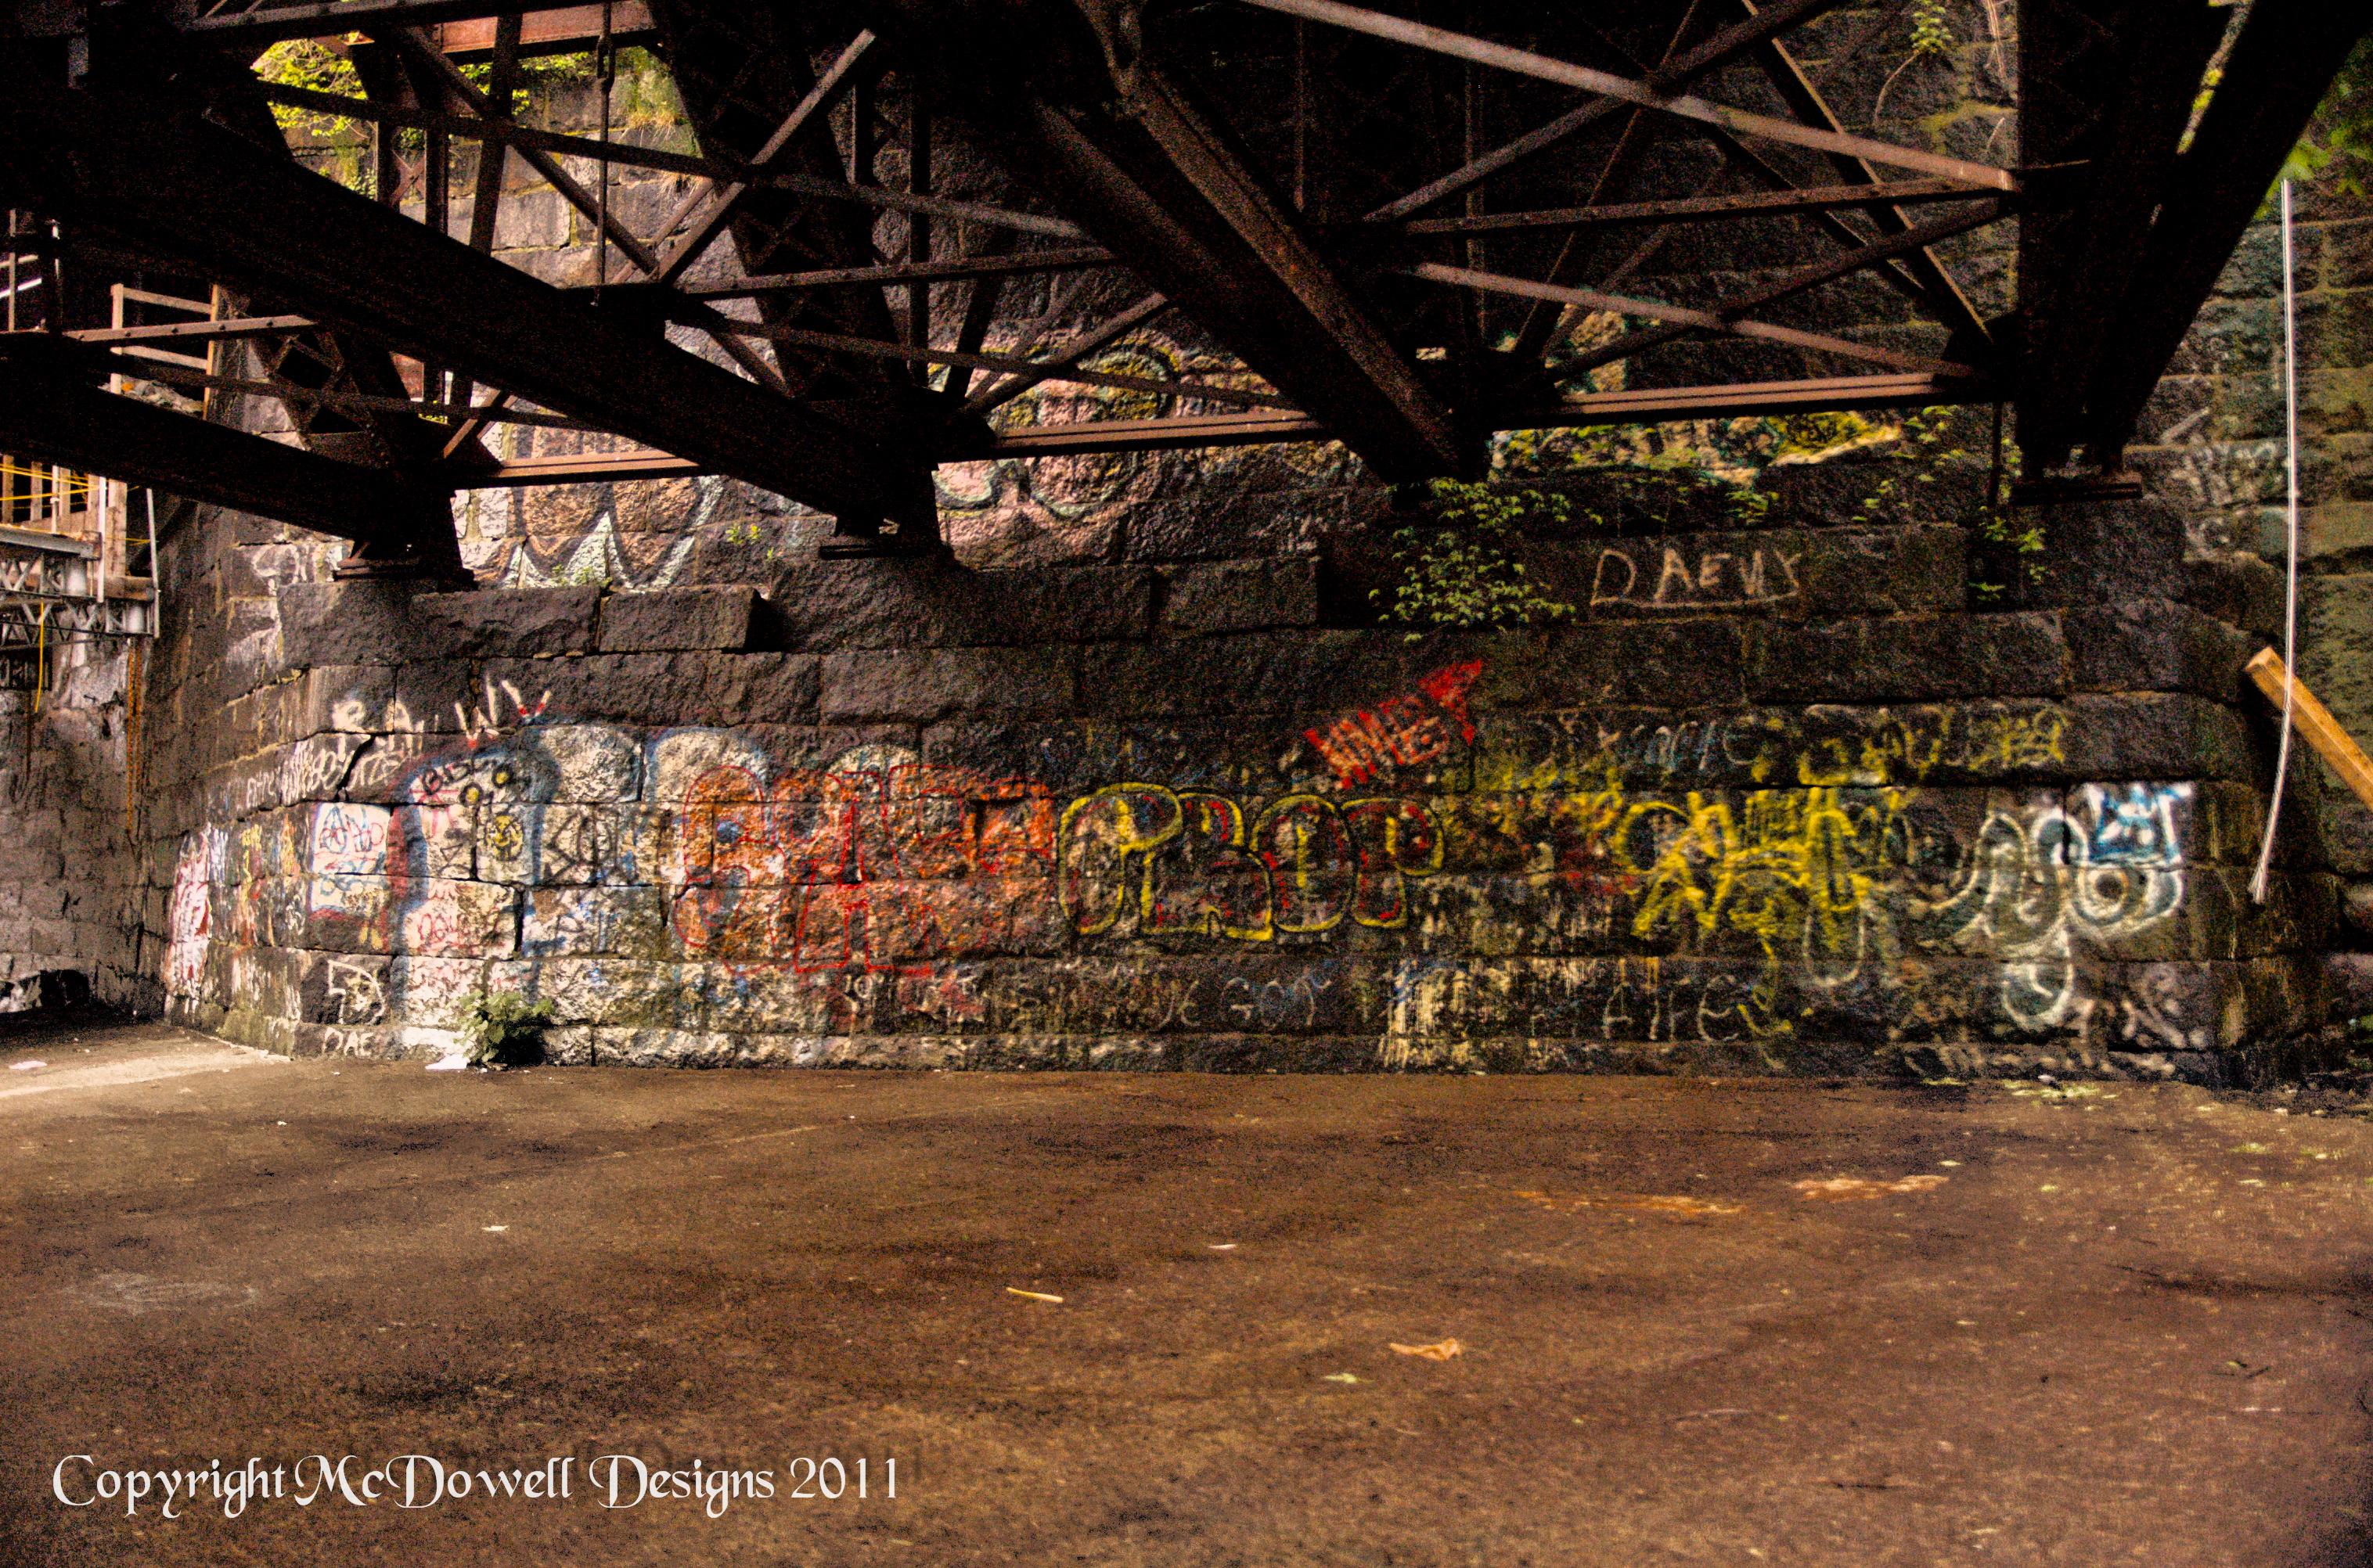 87. Under the Bridge | McDowell's Journey 365 Days of 2012